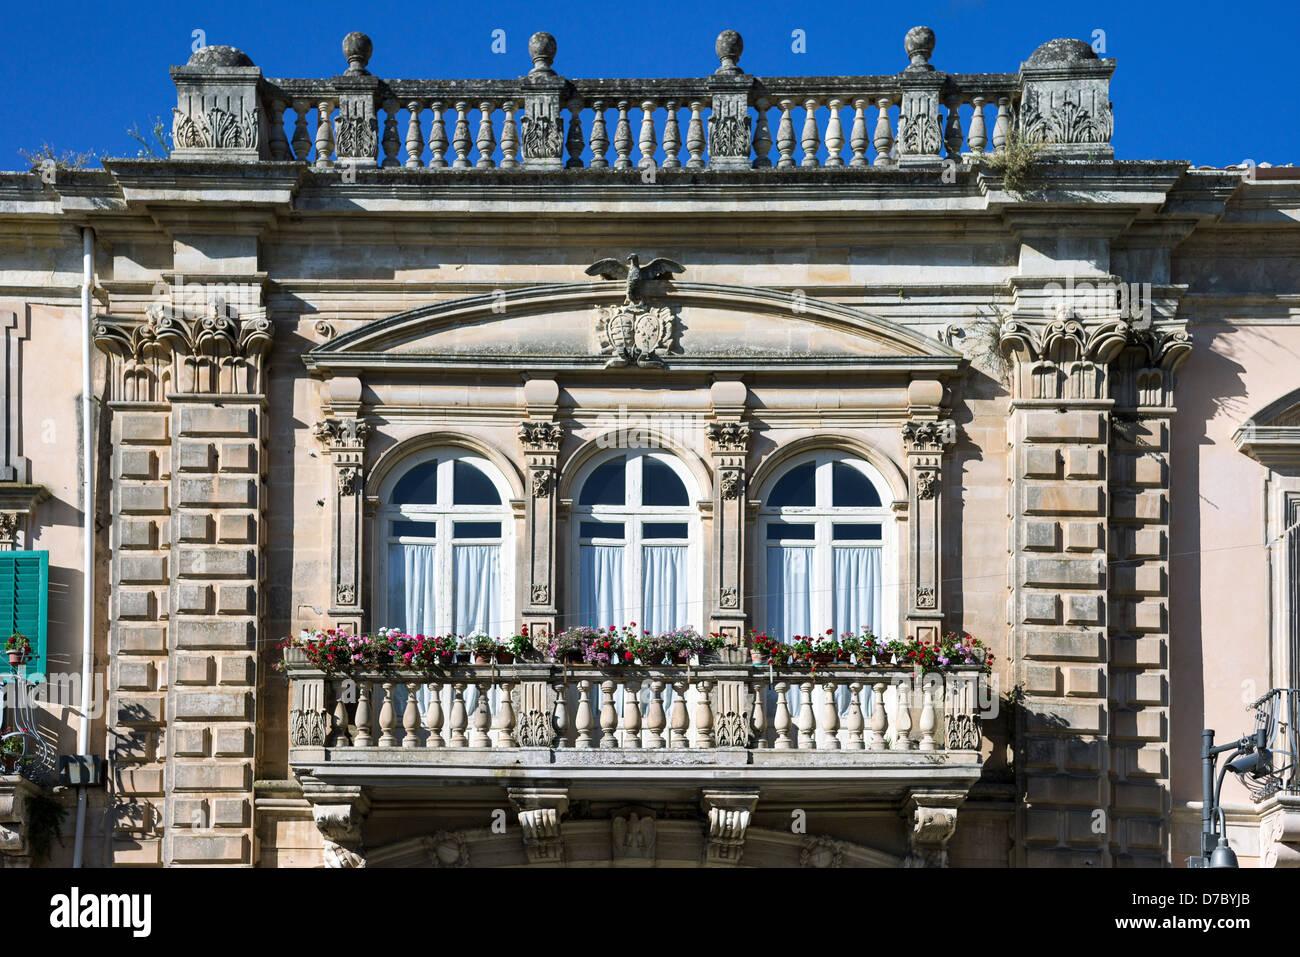 Europa-Italien, Sizilien, Ragusa, Ibla, Piazza del Duomo, dem Sanfilippo-Palast-Balkon Stockbild